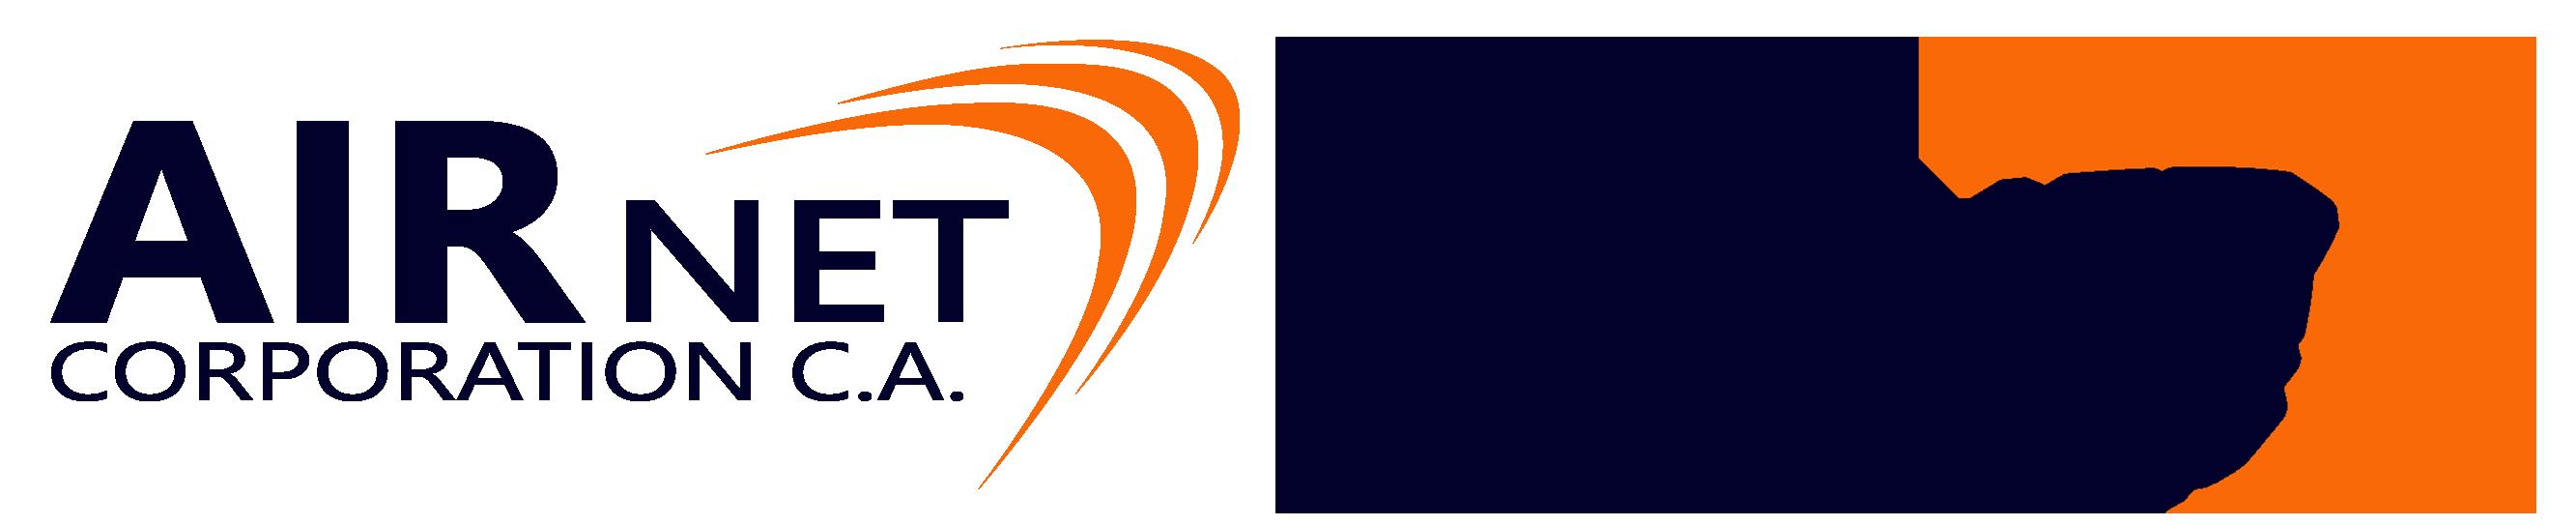 AirNet Corp